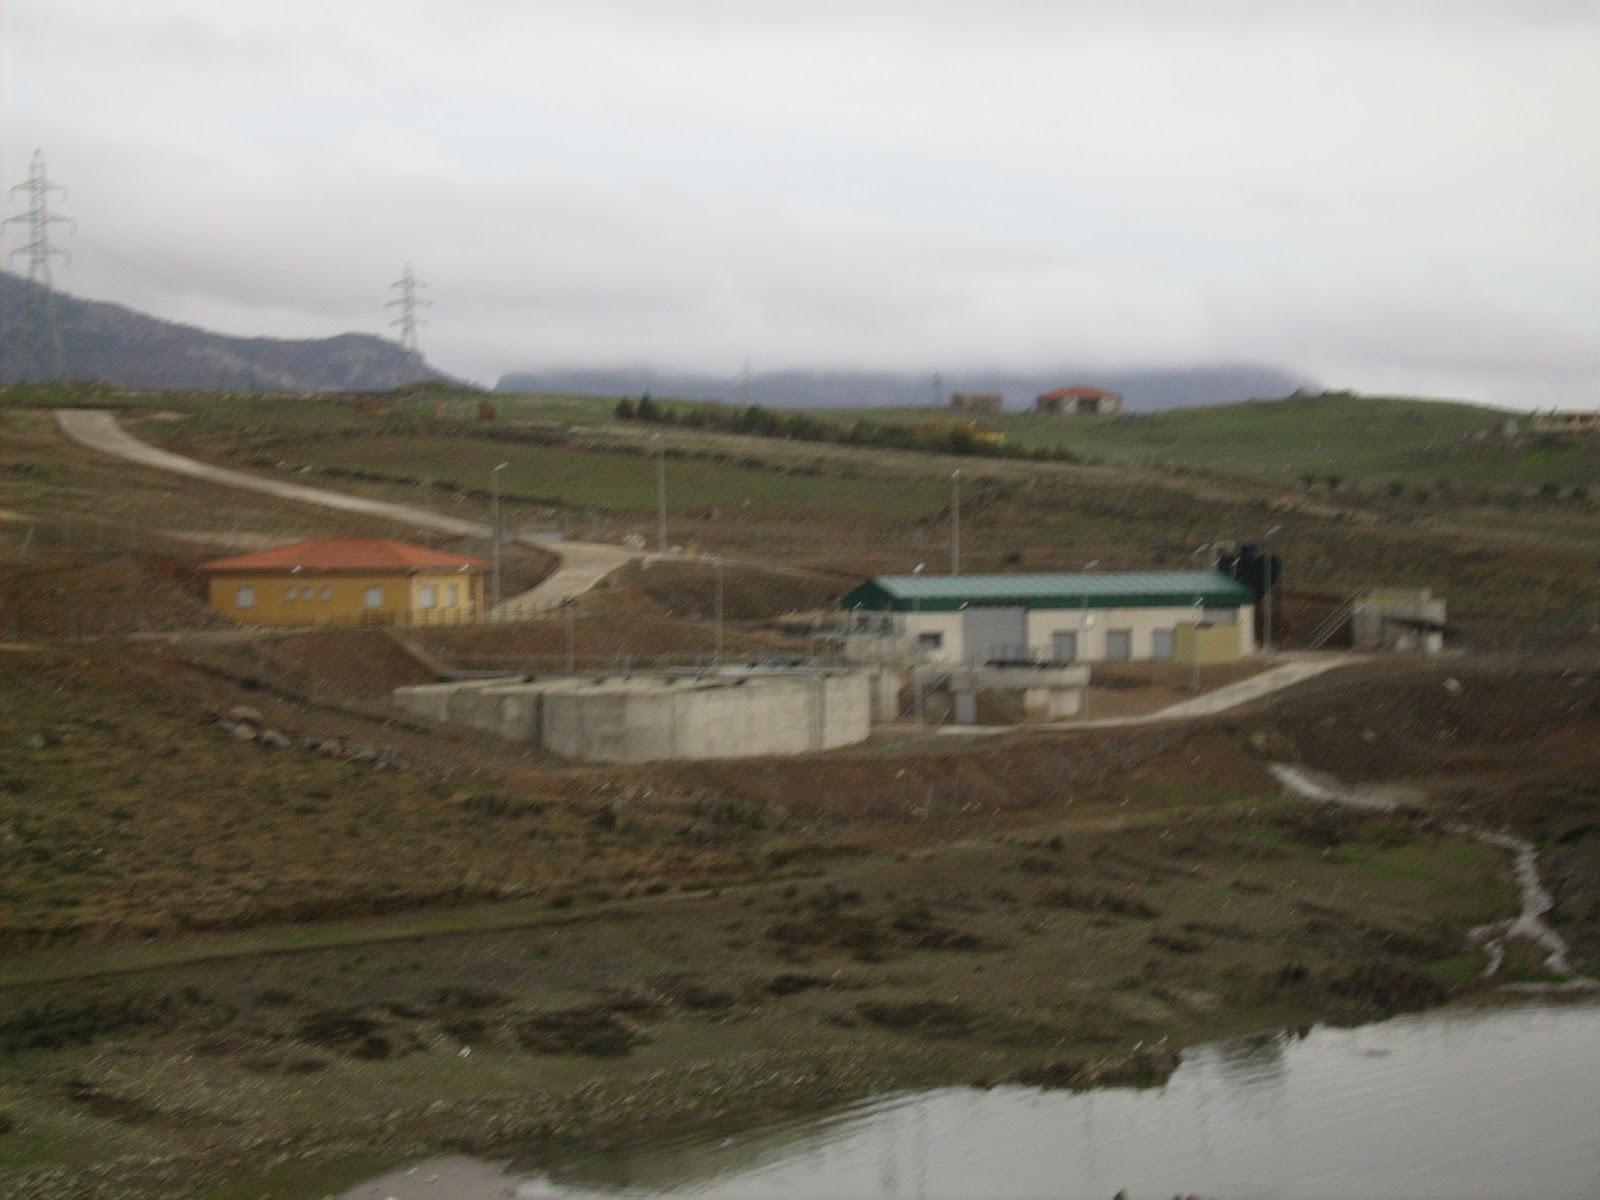 Ipex orellana depuradora aguas residuales for Depuradora aguas residuales